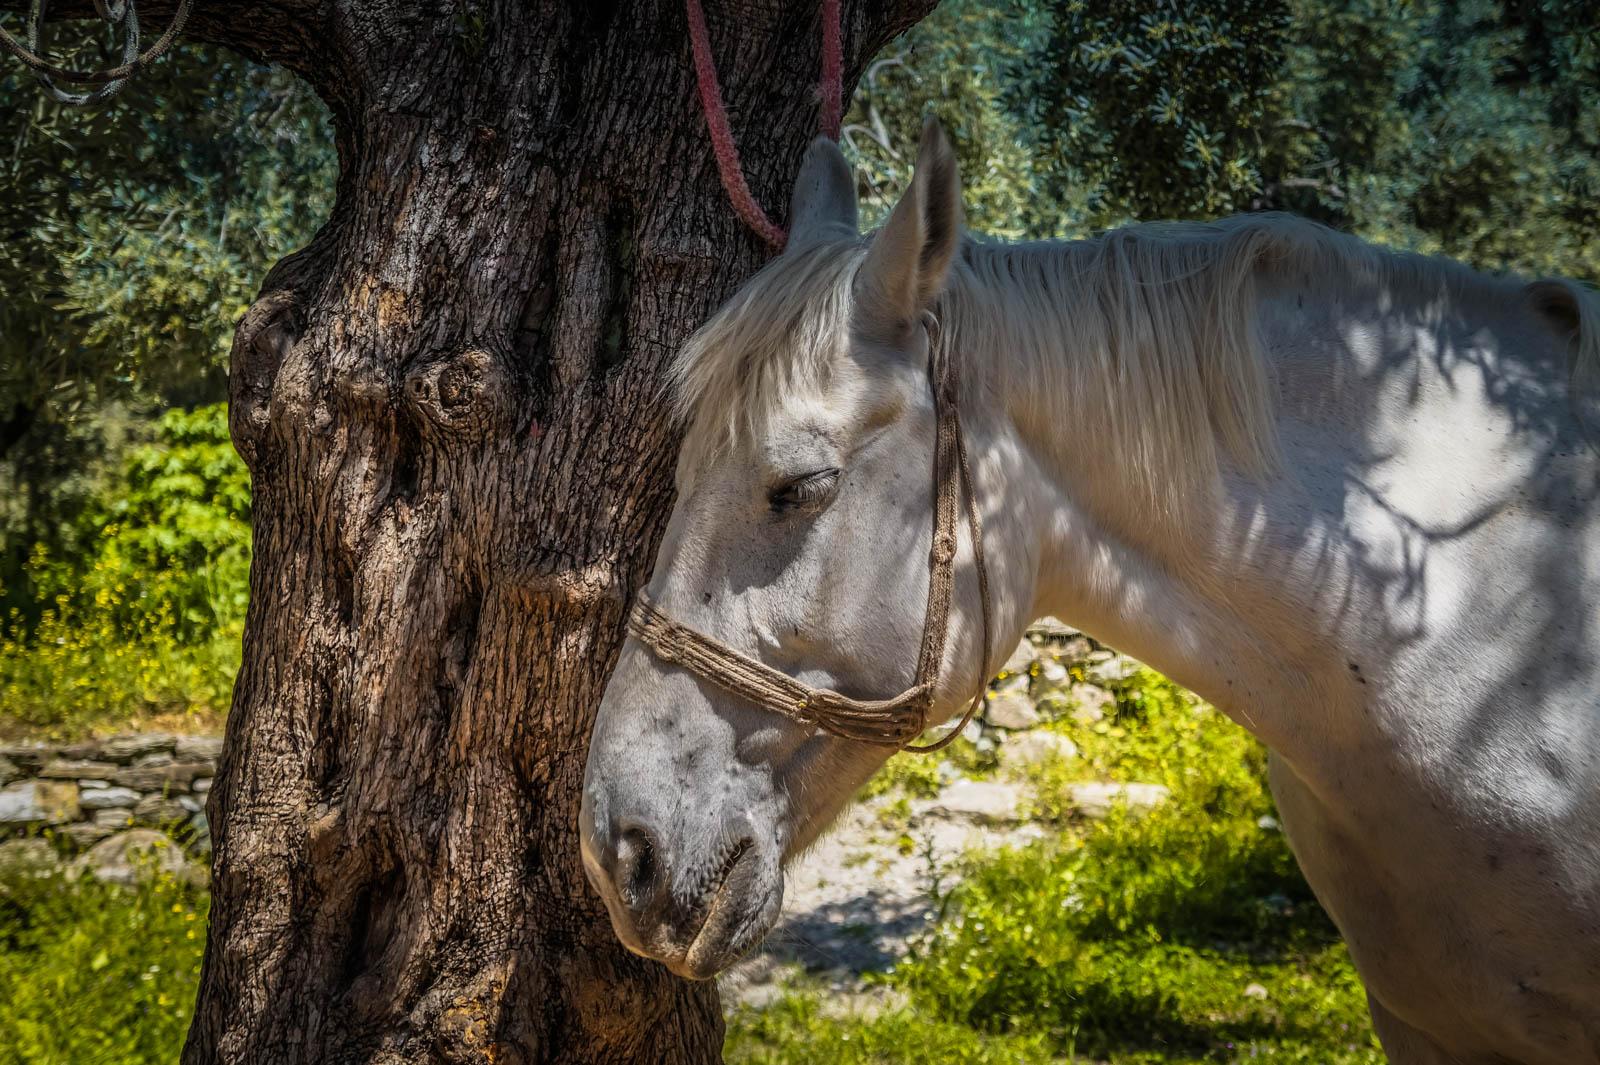 horseback-riding-pelion-greece-la-vie-en-blog-all-rights-reserved